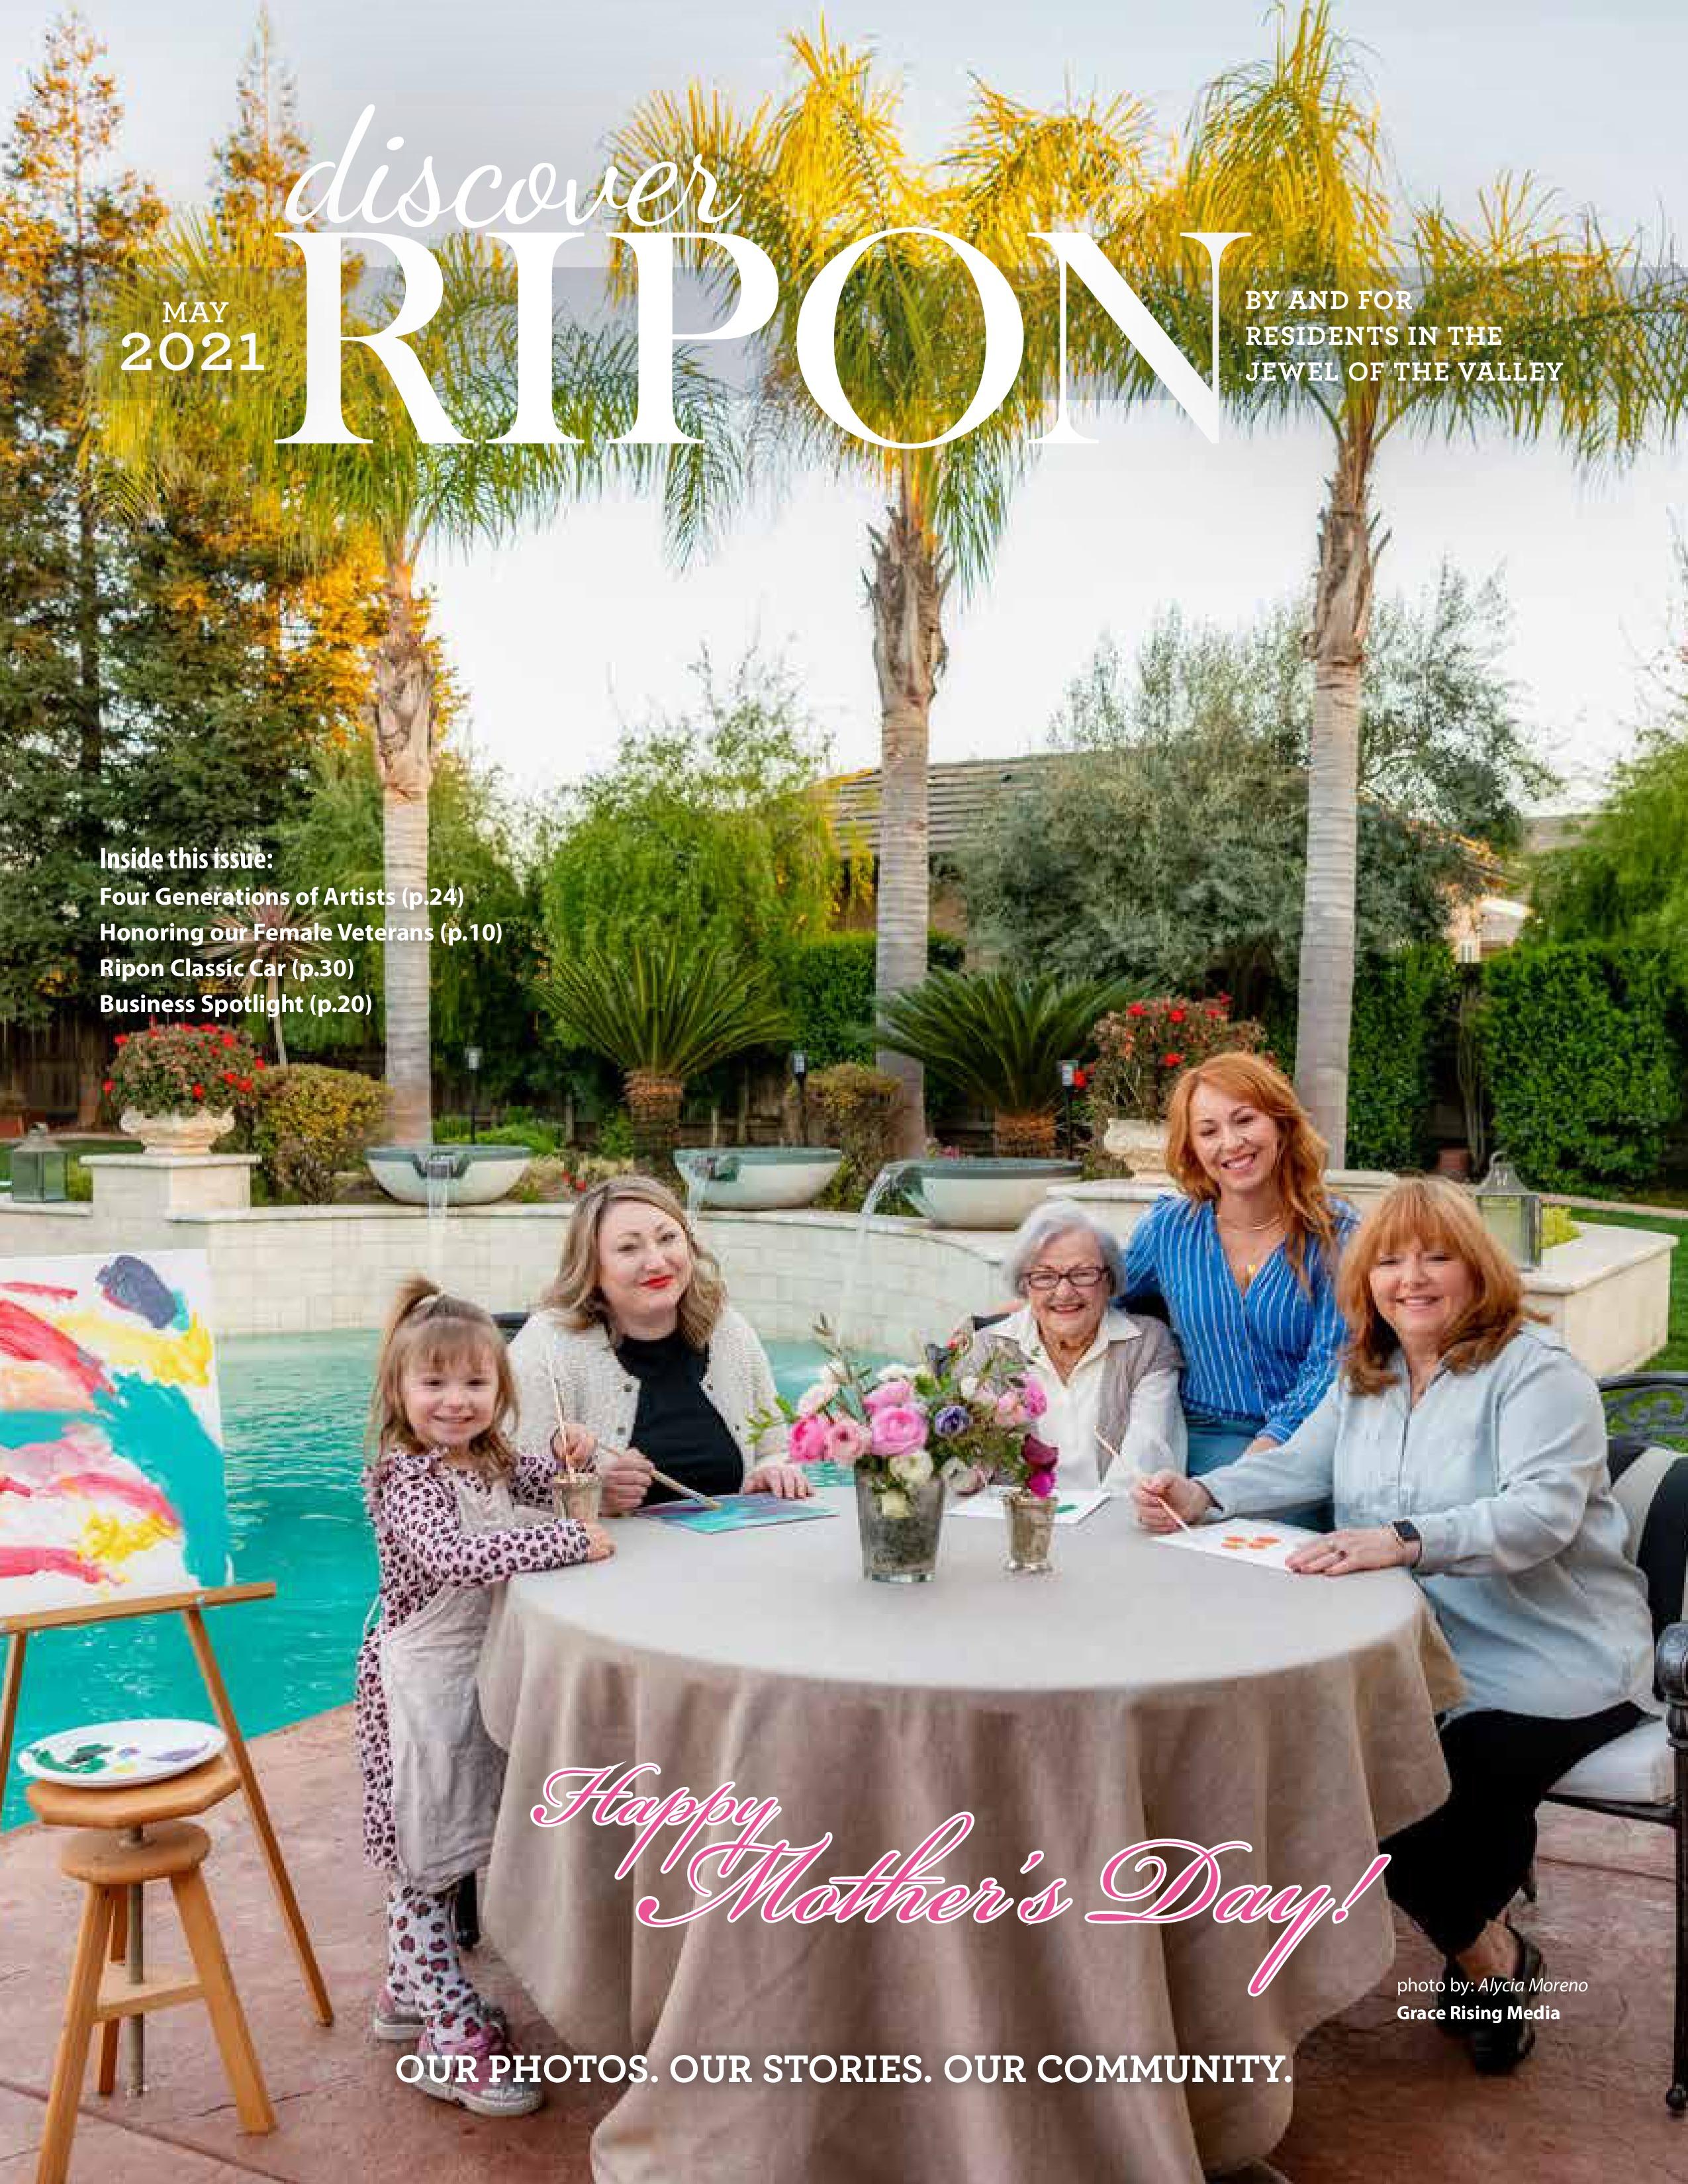 Discover Ripon 2021-05-01